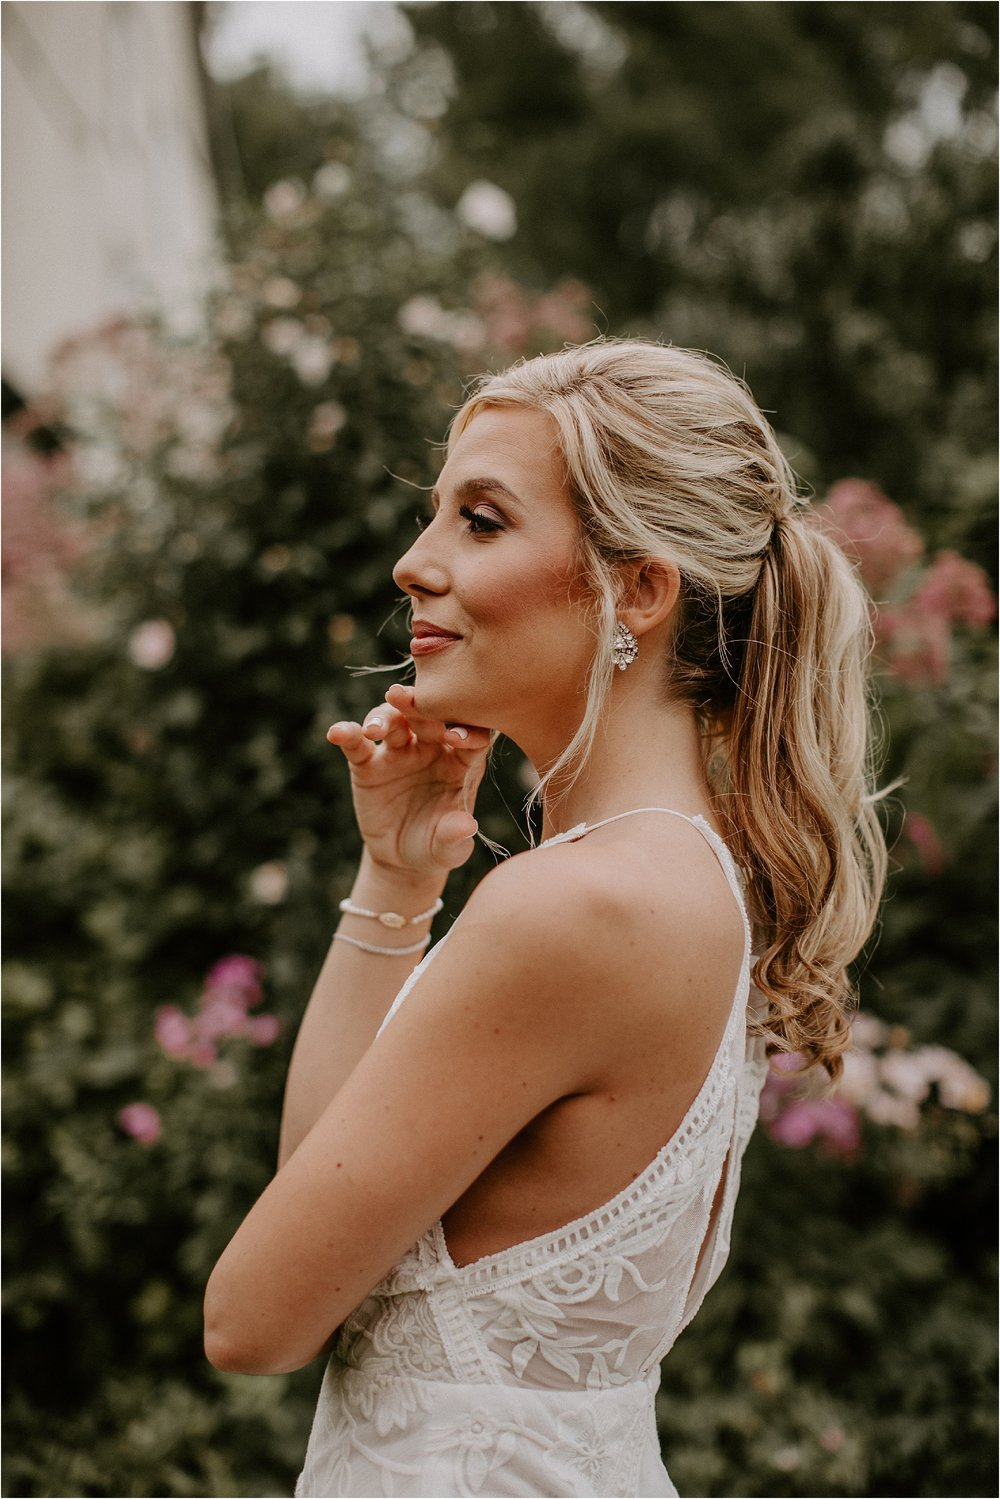 Sarah_Brookhart_Hortulus_Farm_Garden_and_Nursey_Wedding_Photographer_0019.jpg